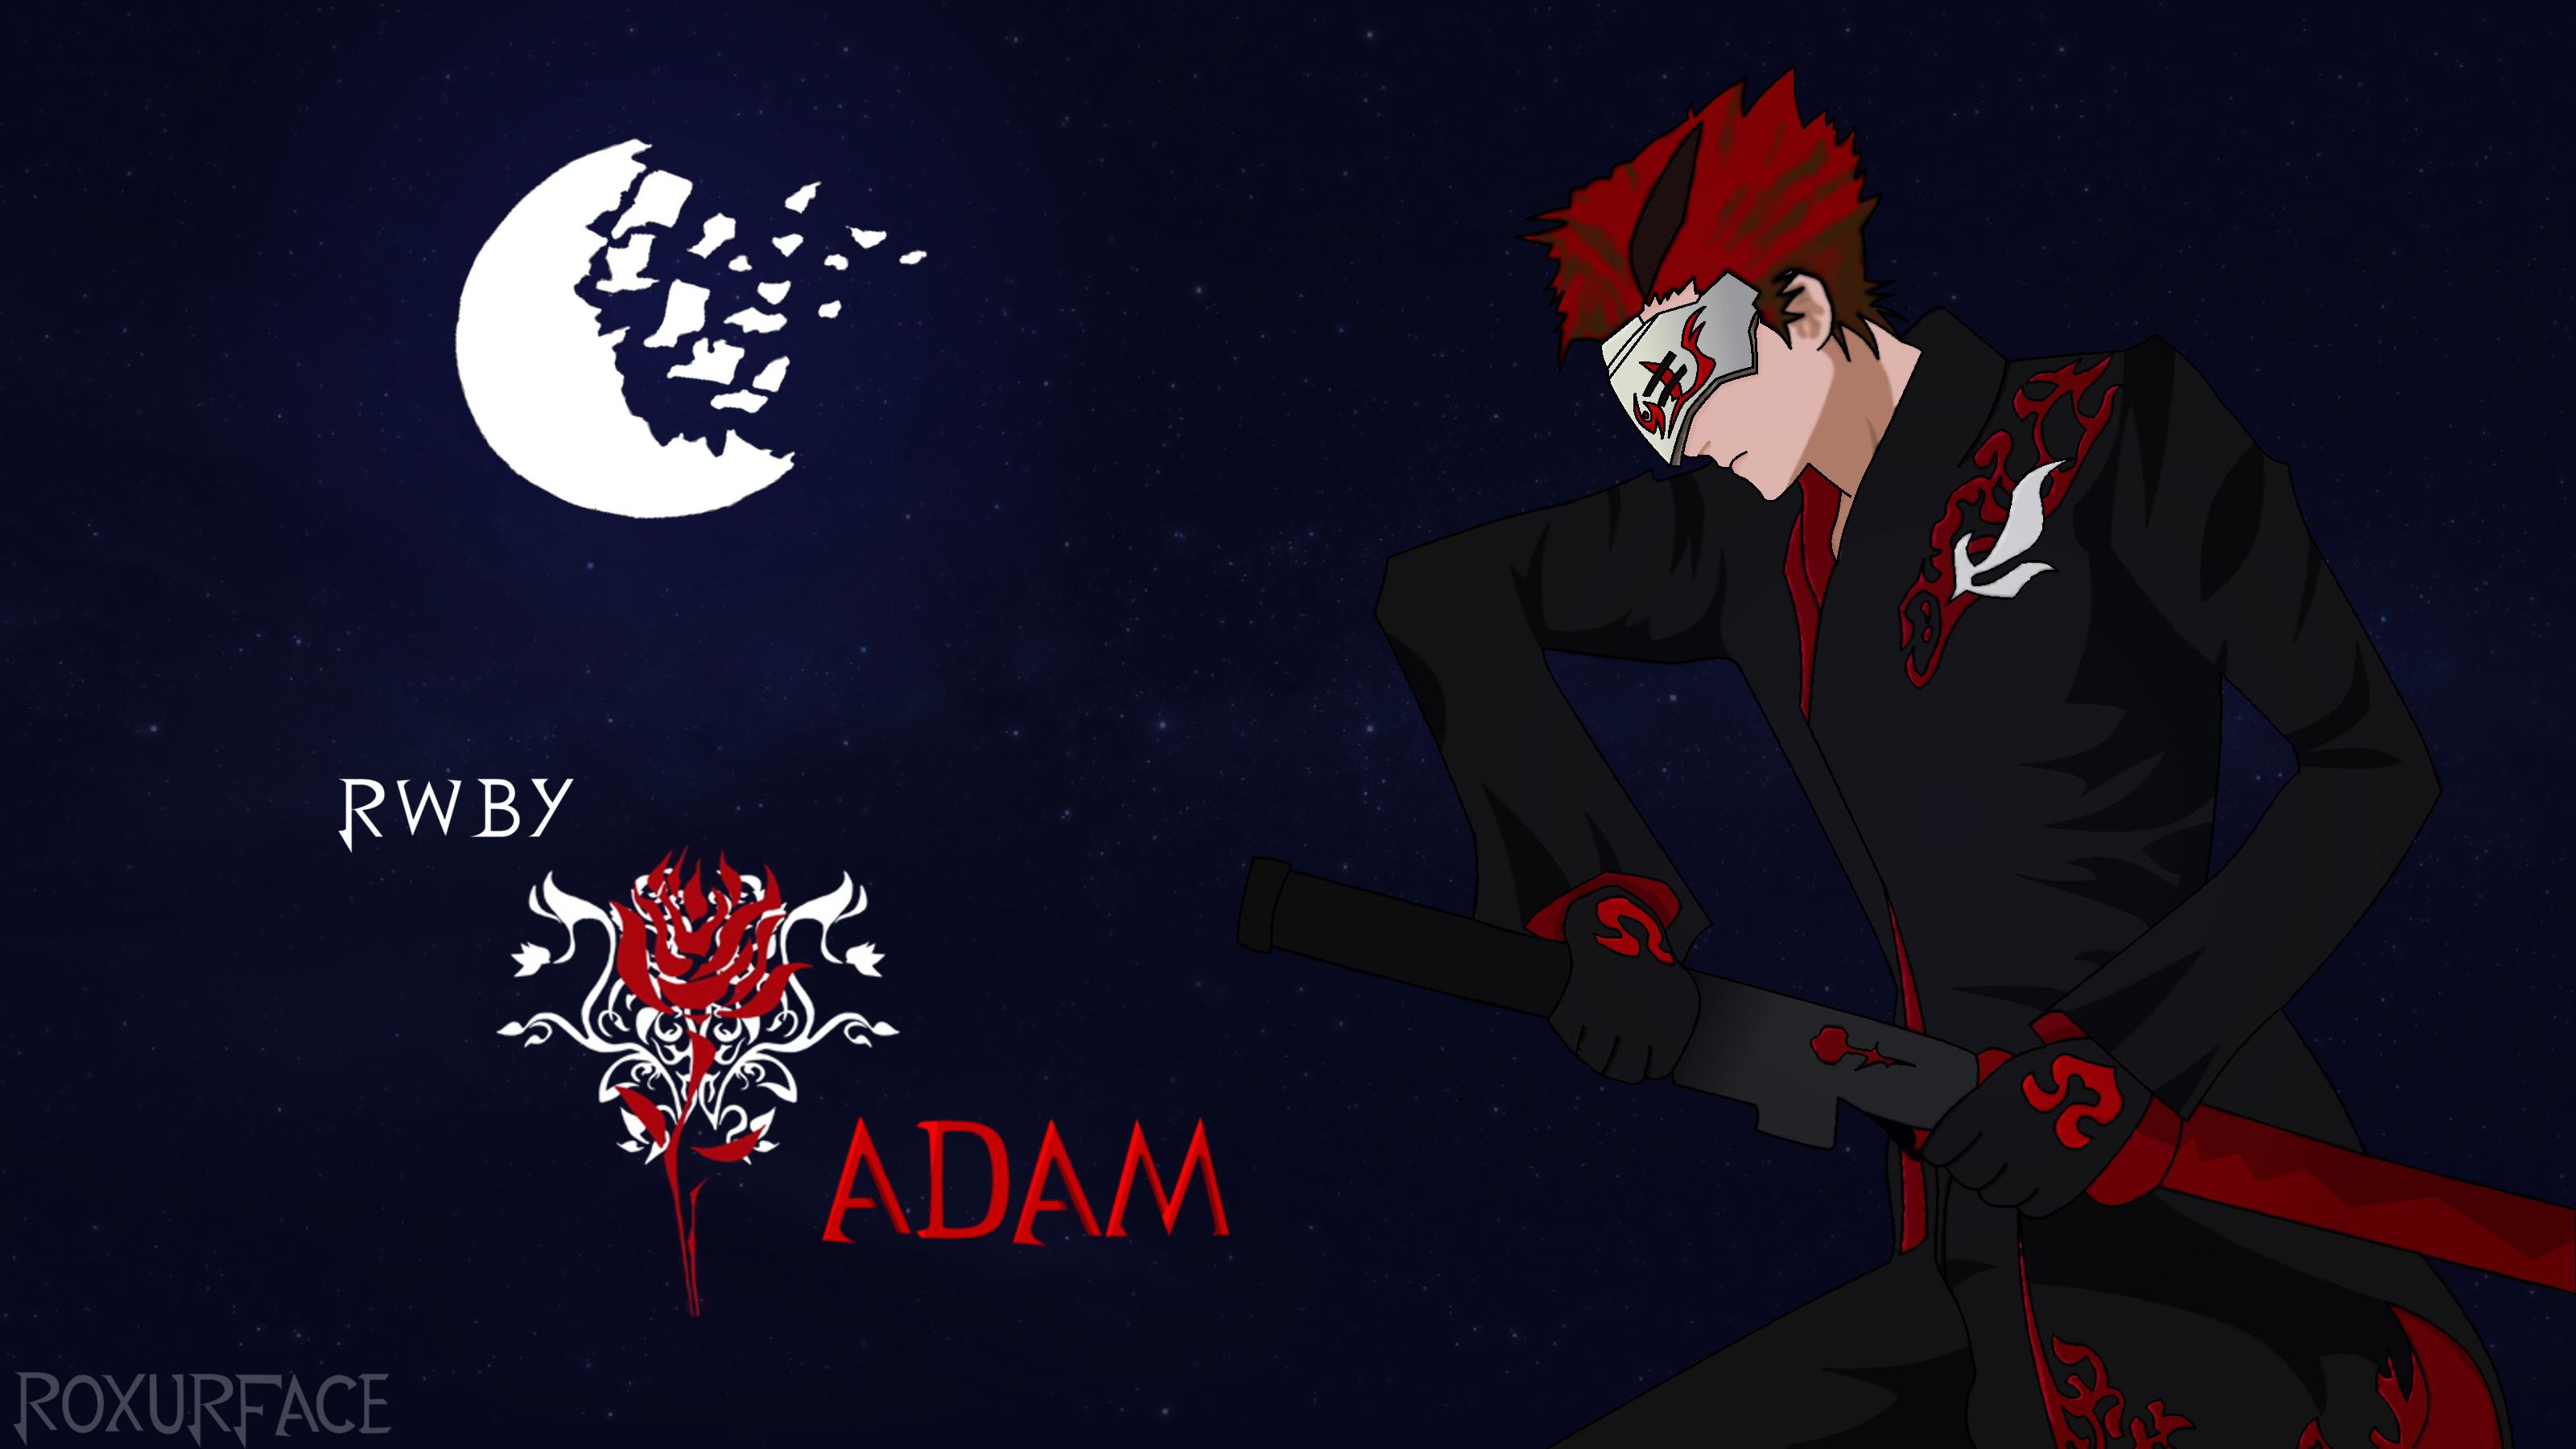 … RWBY Adam Background / Wallpaper (HD) by Roxurface28